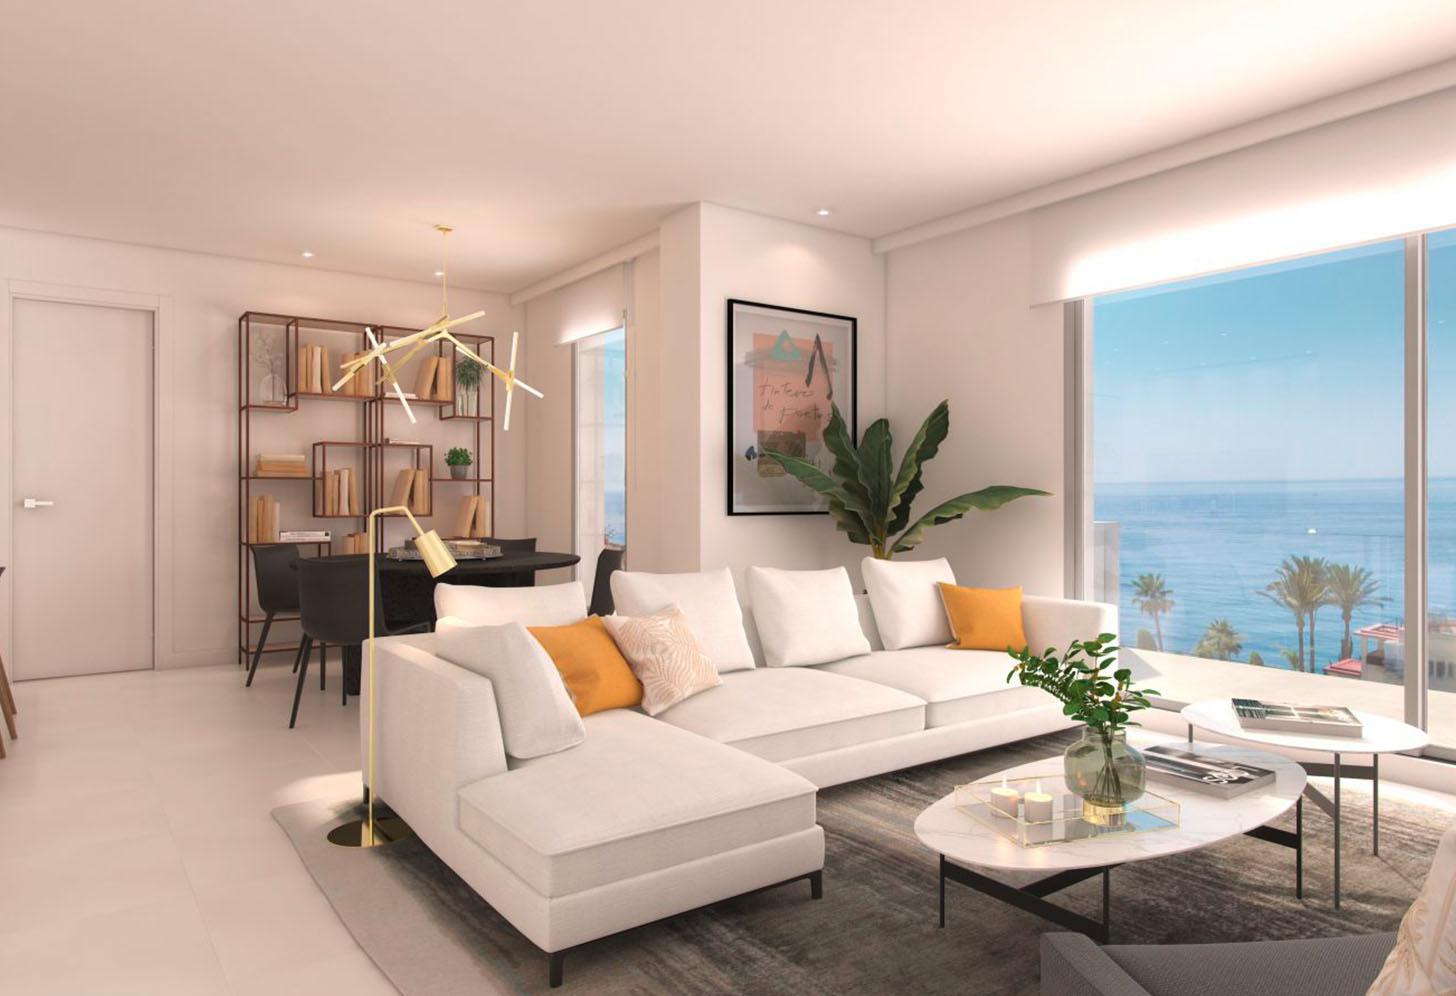 immobilier neuf espagne costa sol salon 2